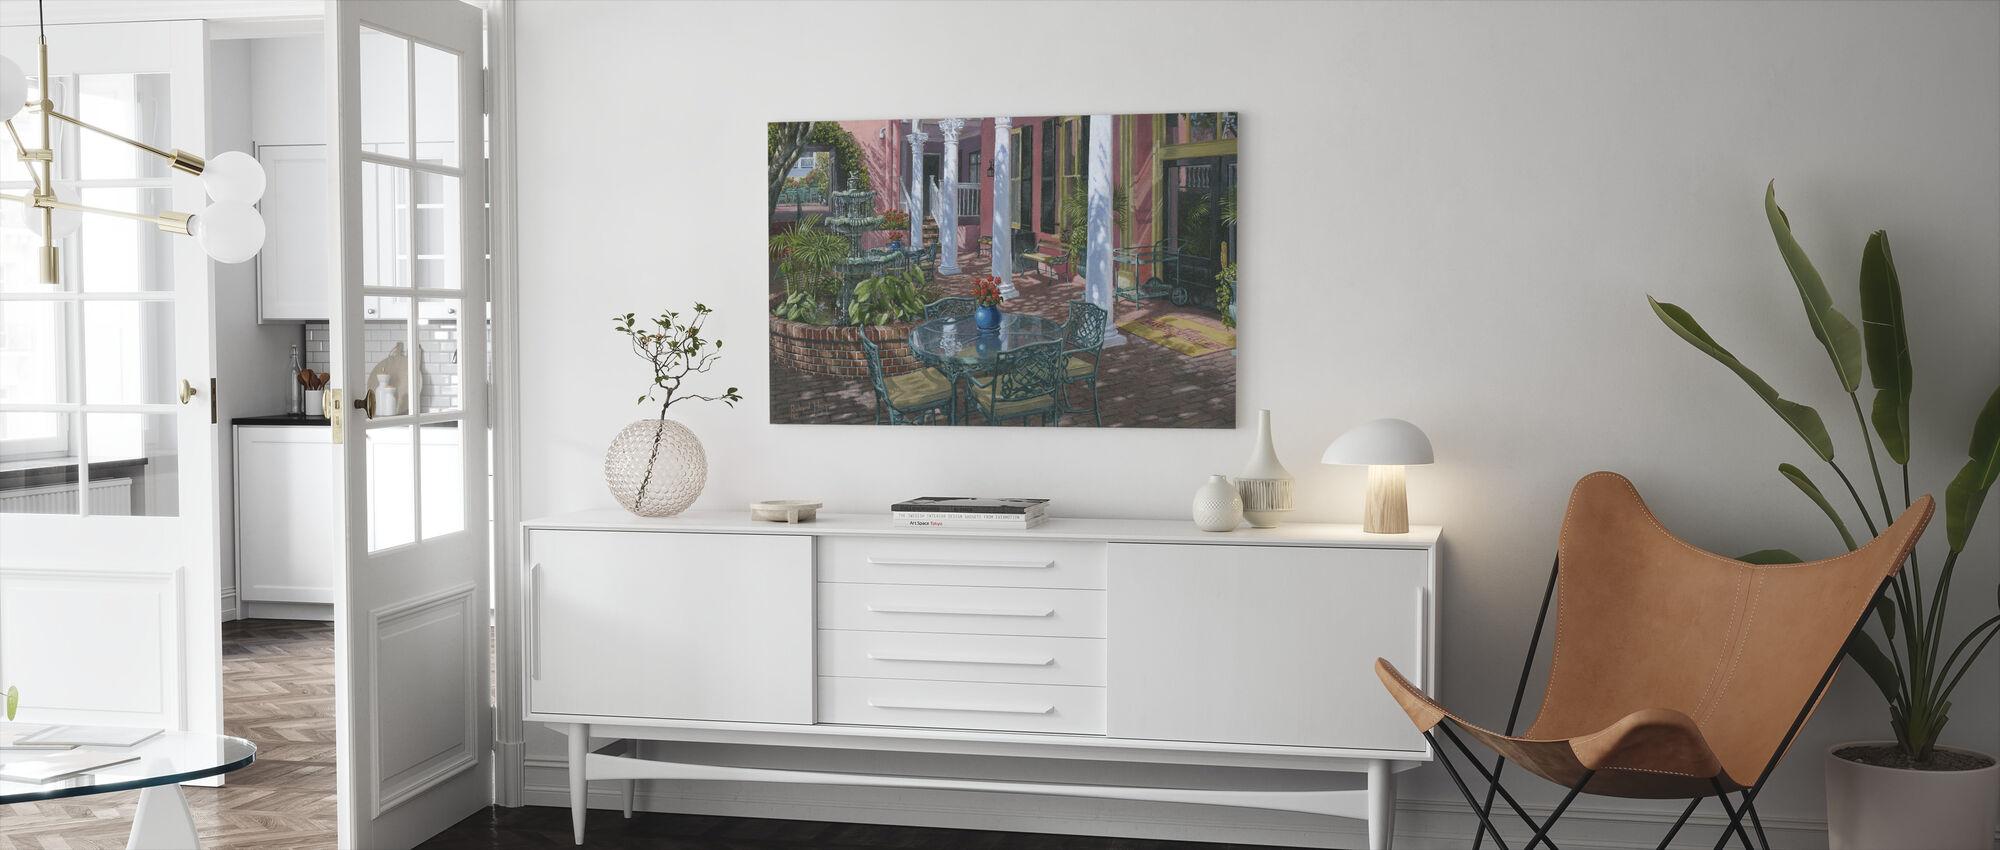 Meeting Street Inn Charleston - Canvas print - Living Room